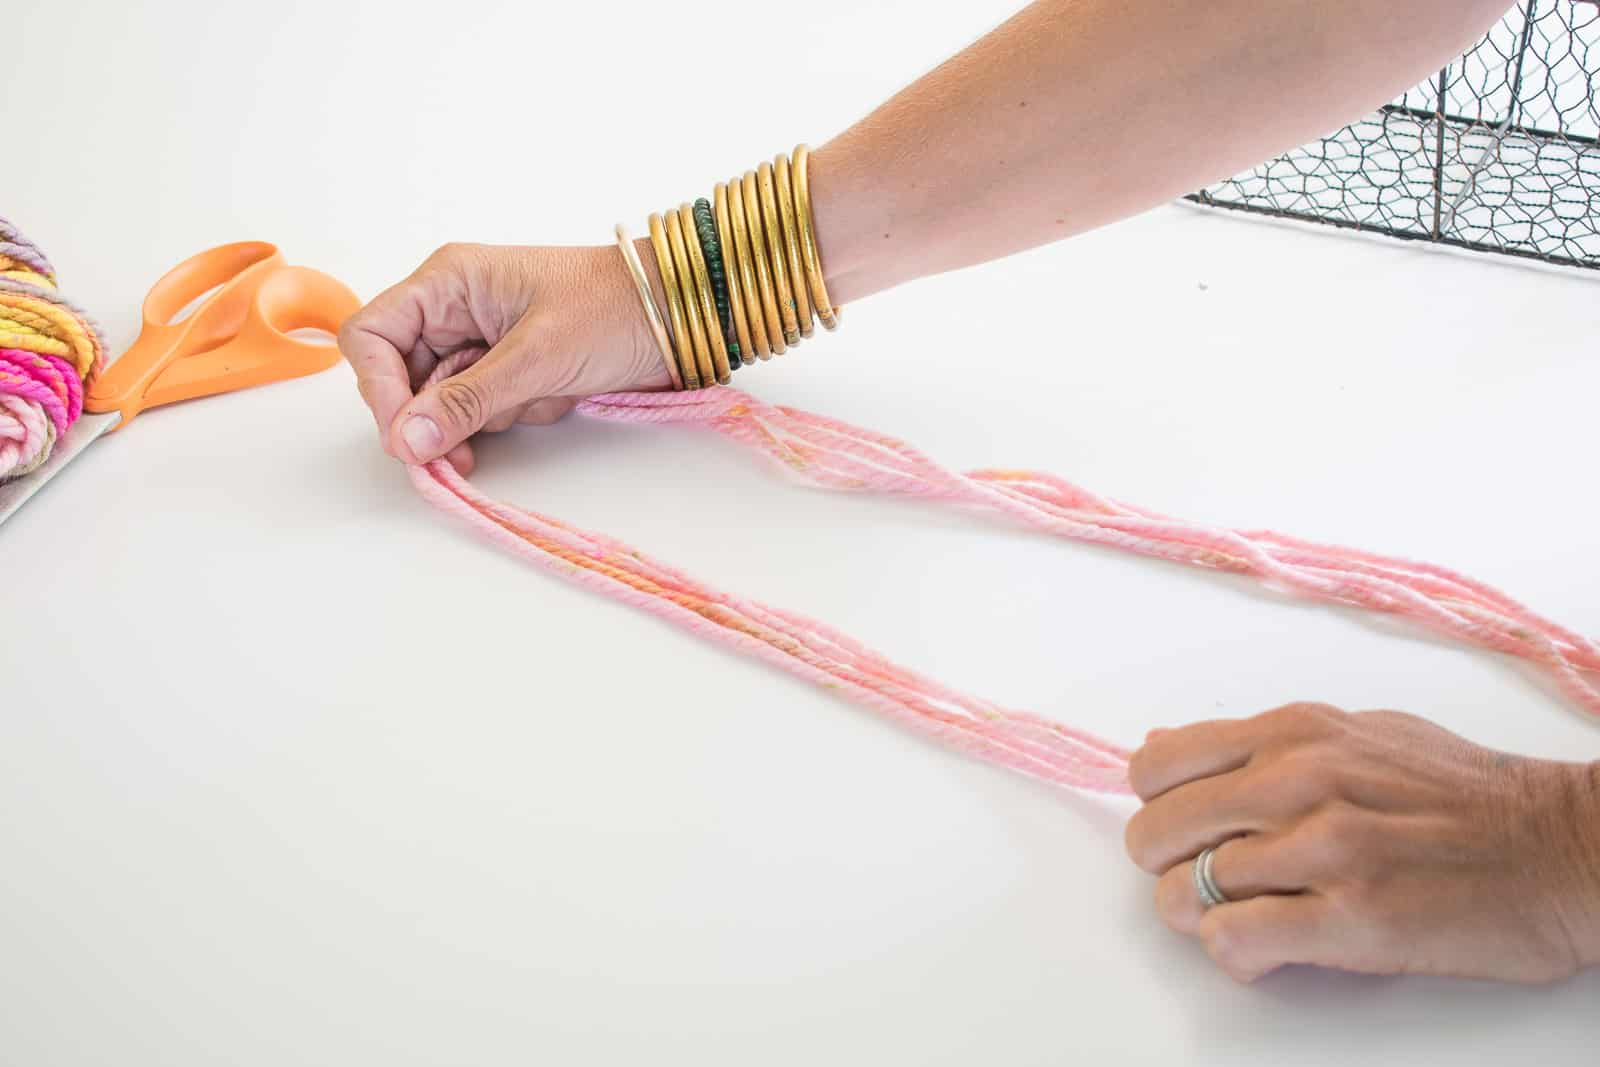 double or quadruple strands of yarn